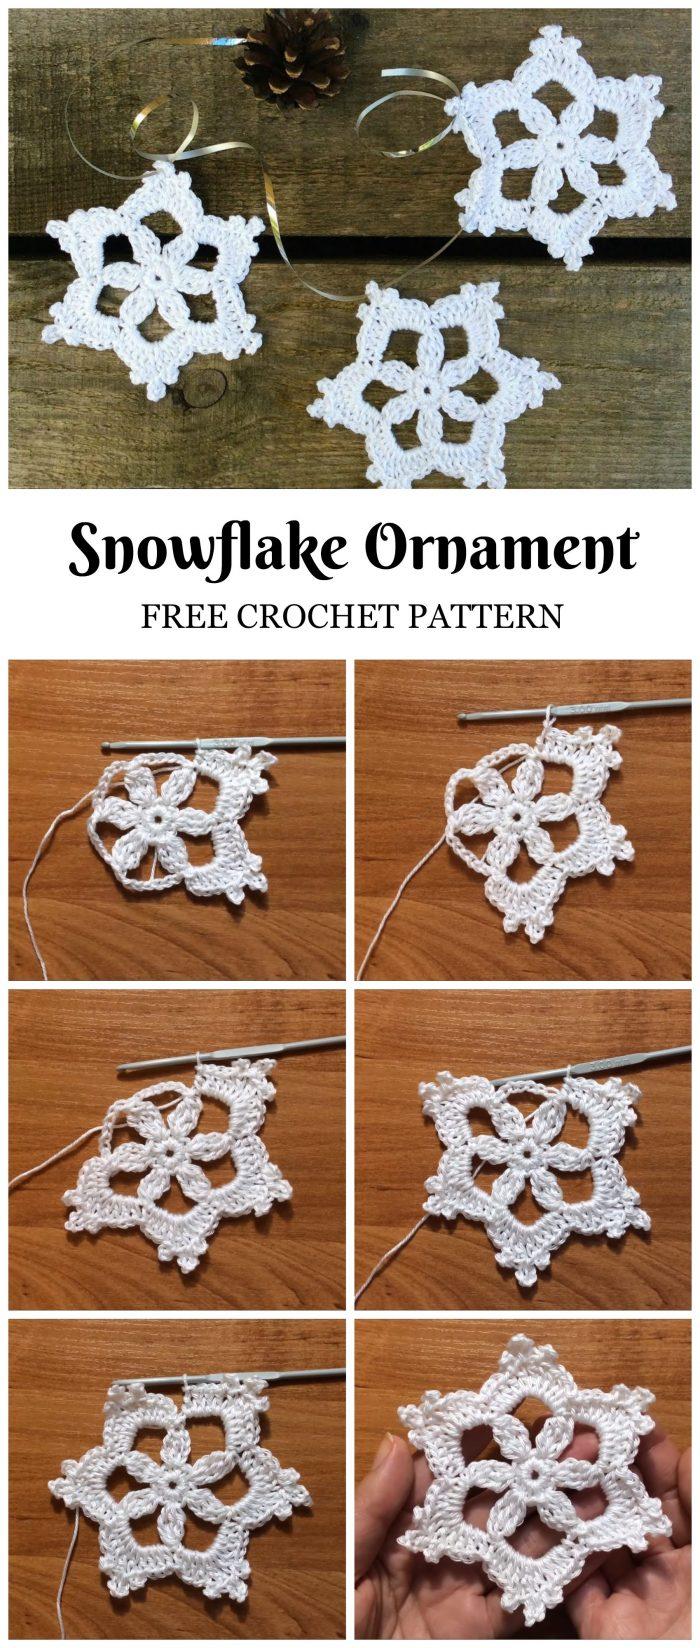 Crochet Snowflake Patterns For Beginners